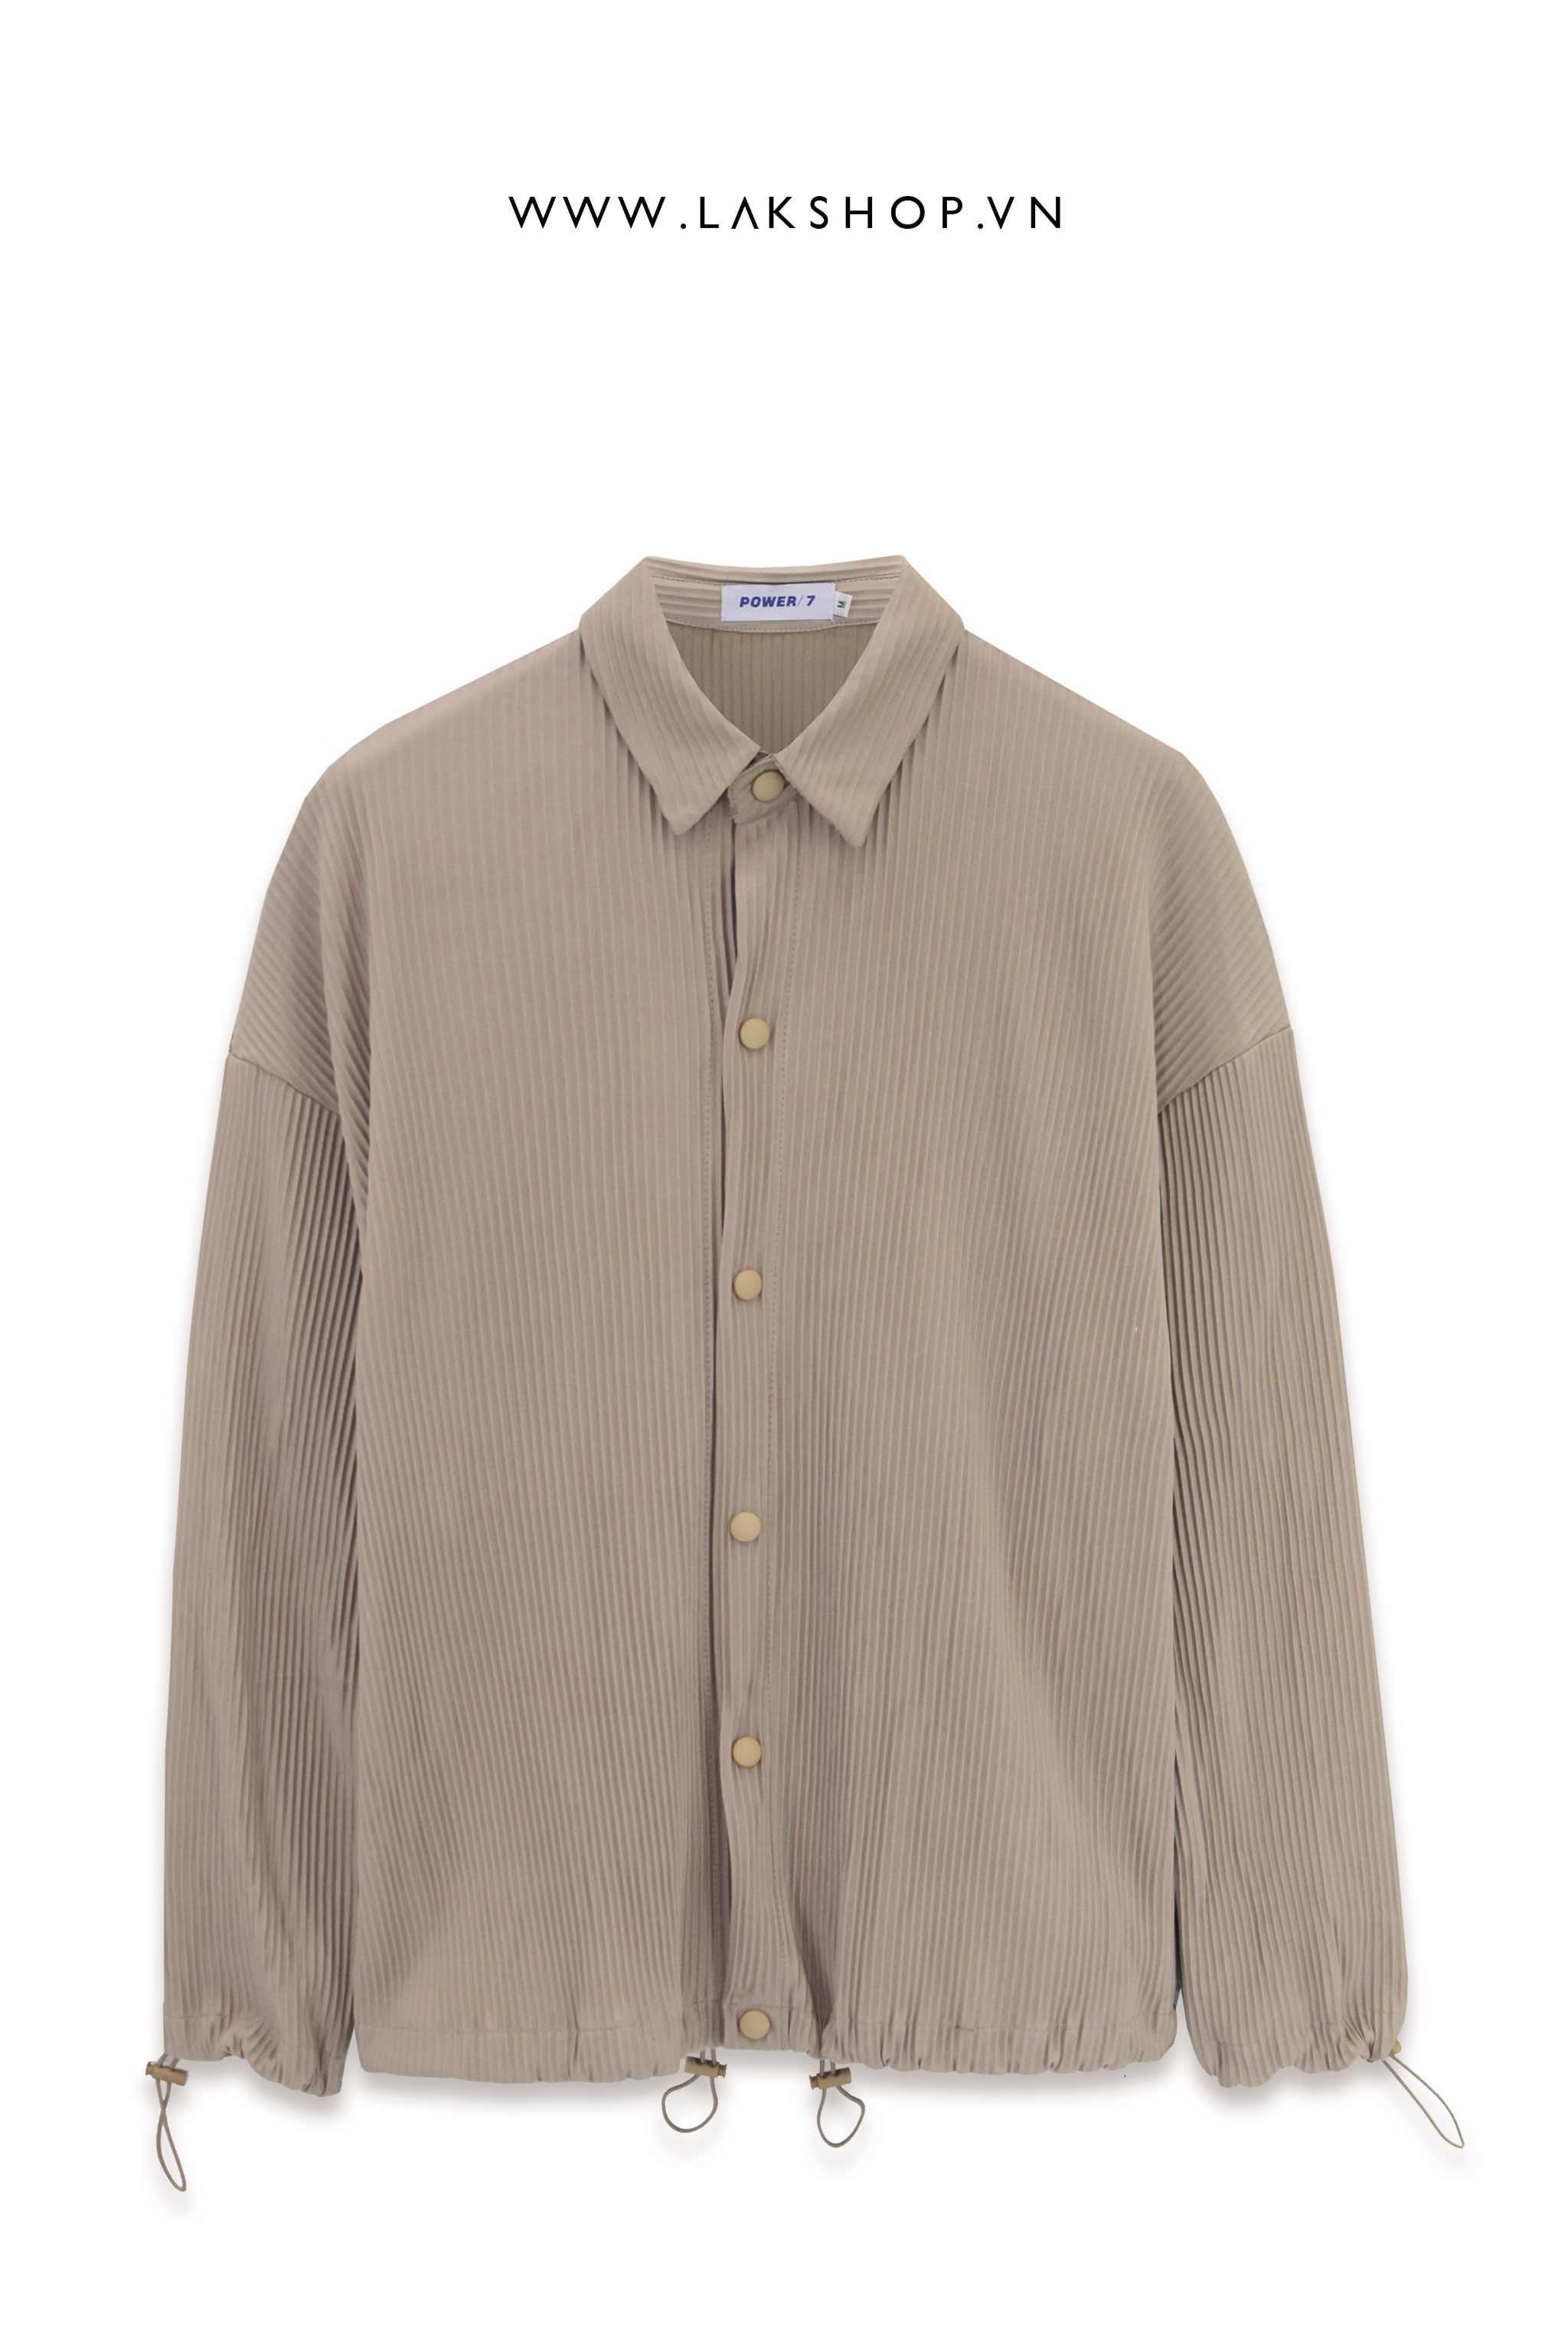 Oversized Pleated Shirt in Begie cv2